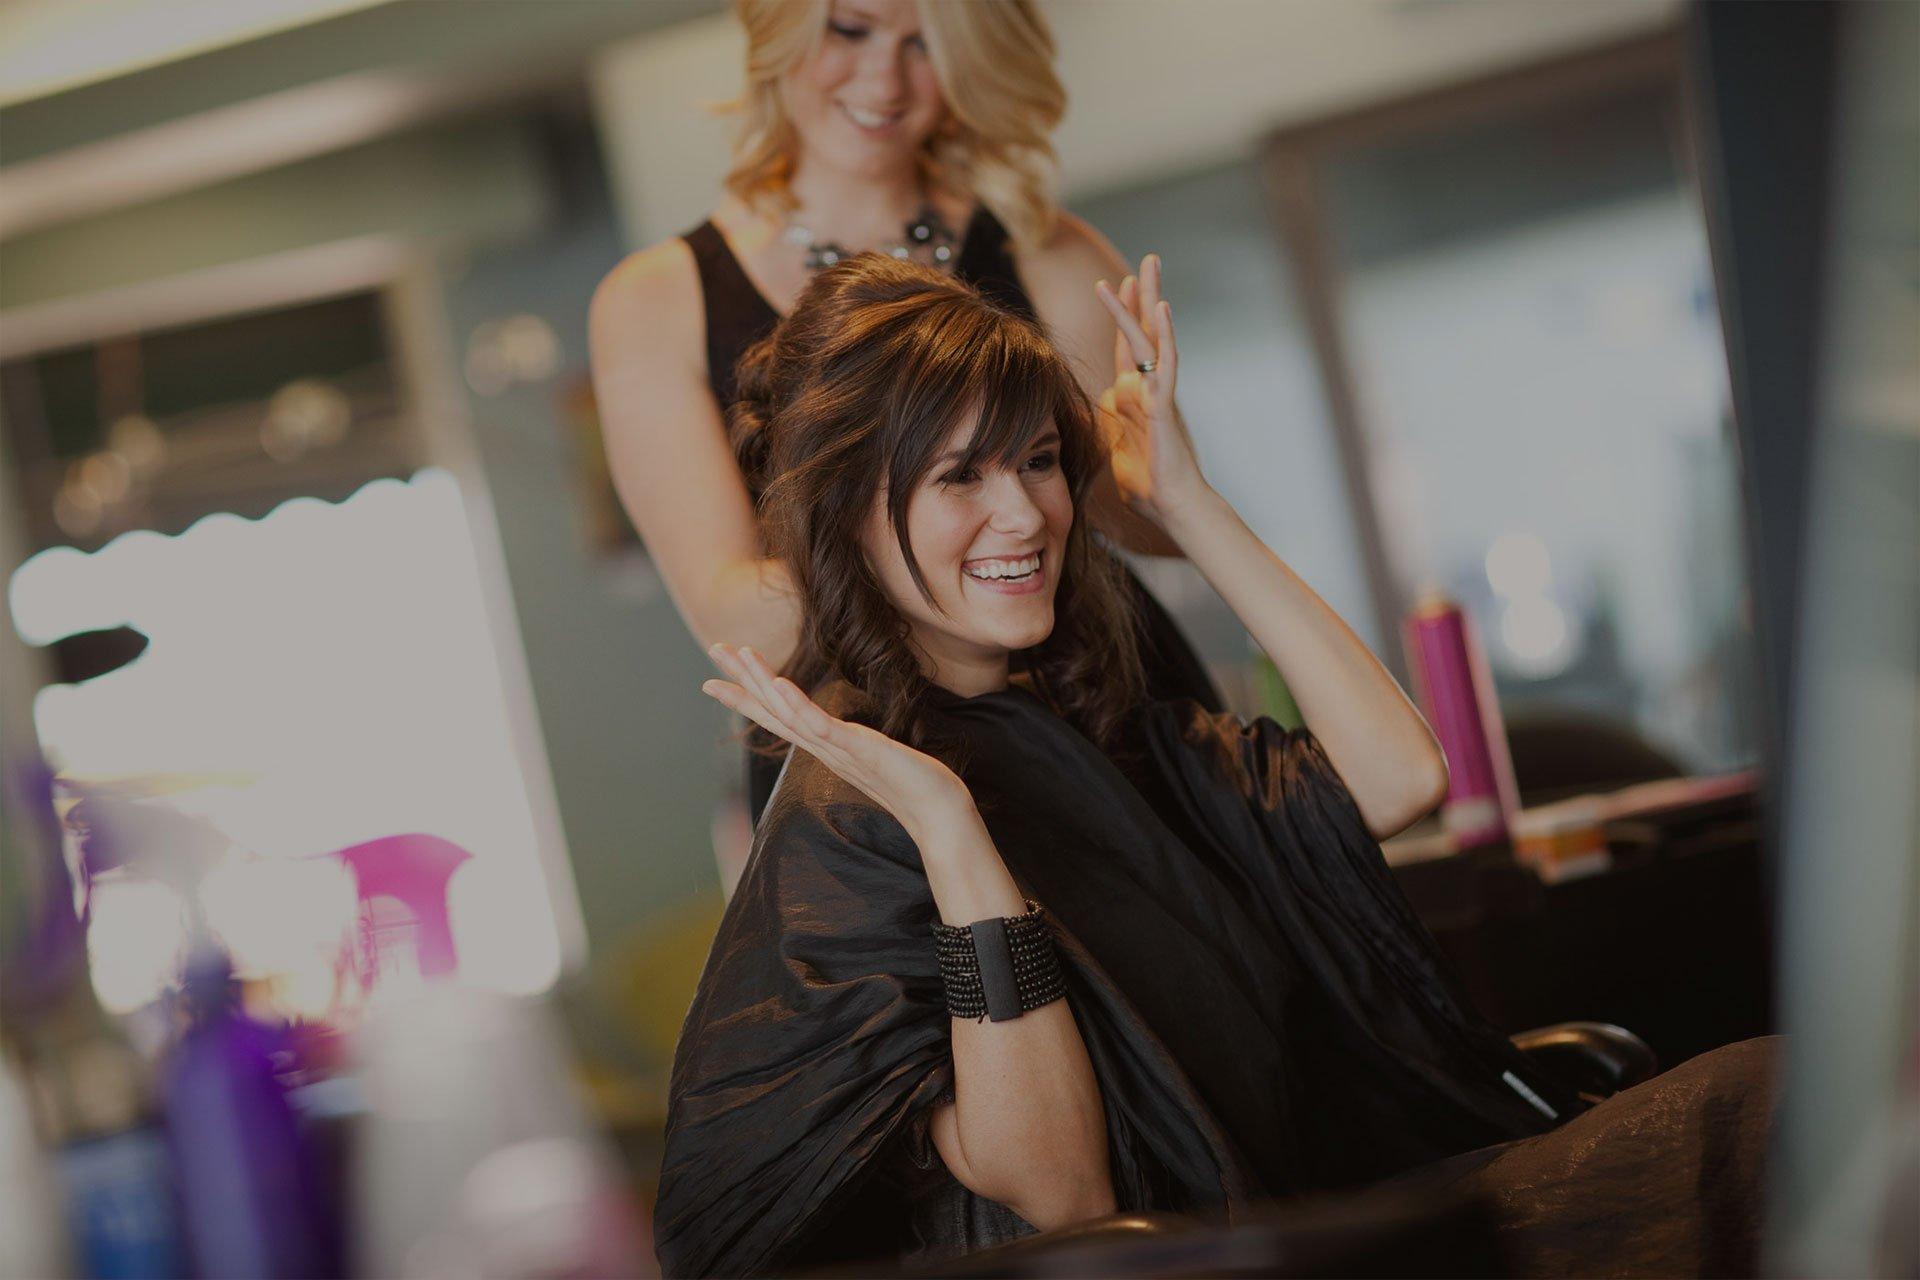 V Charm frizerski salon